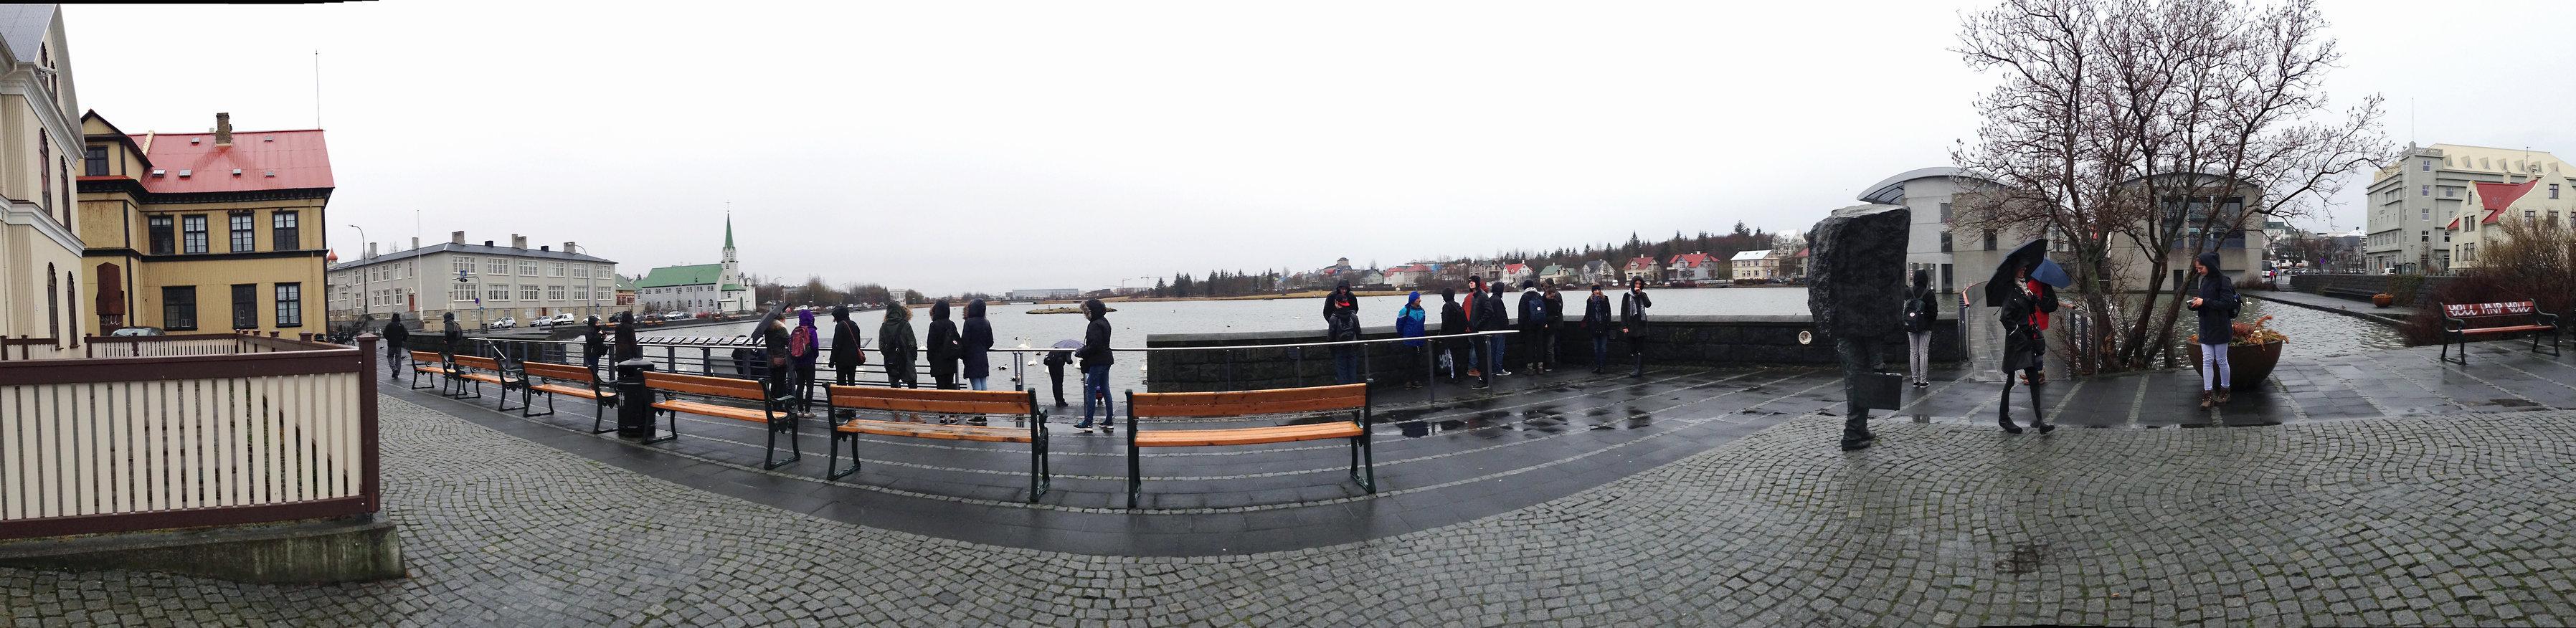 © CORDAY - Iceland, No. 3, River Walk